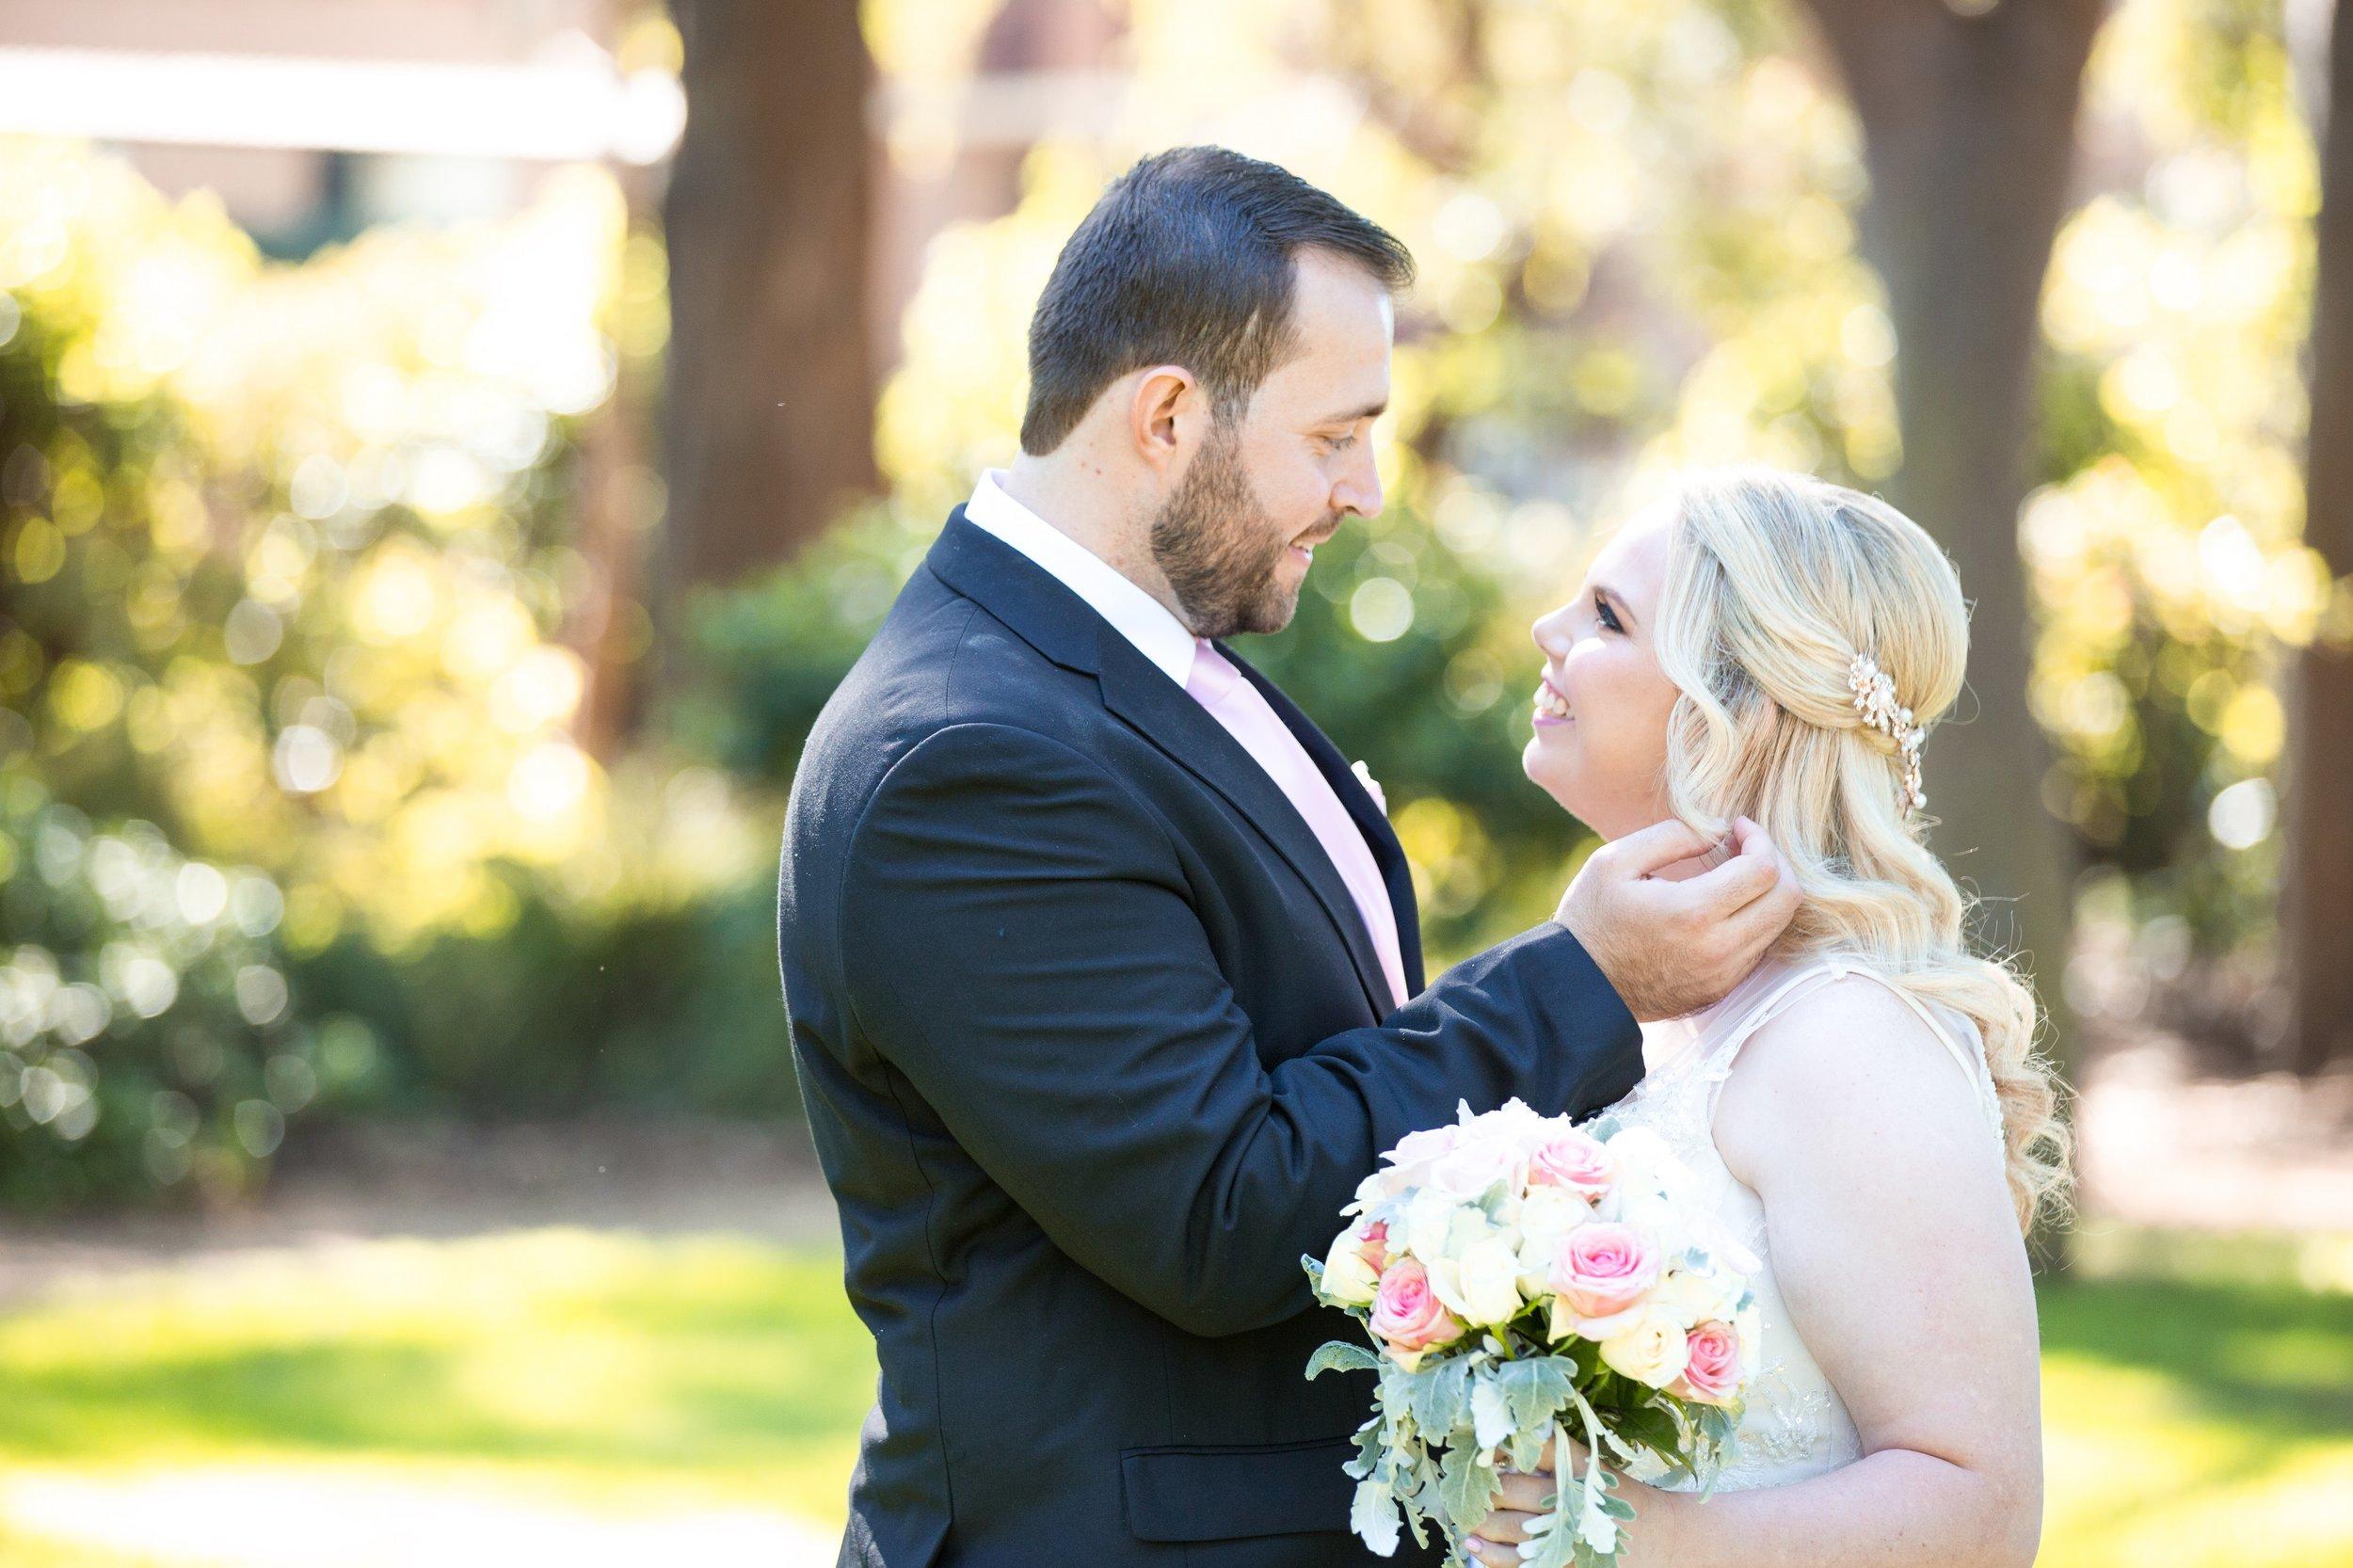 Sydney Wedding Photographer - Jennifer Lam Photography.jpg